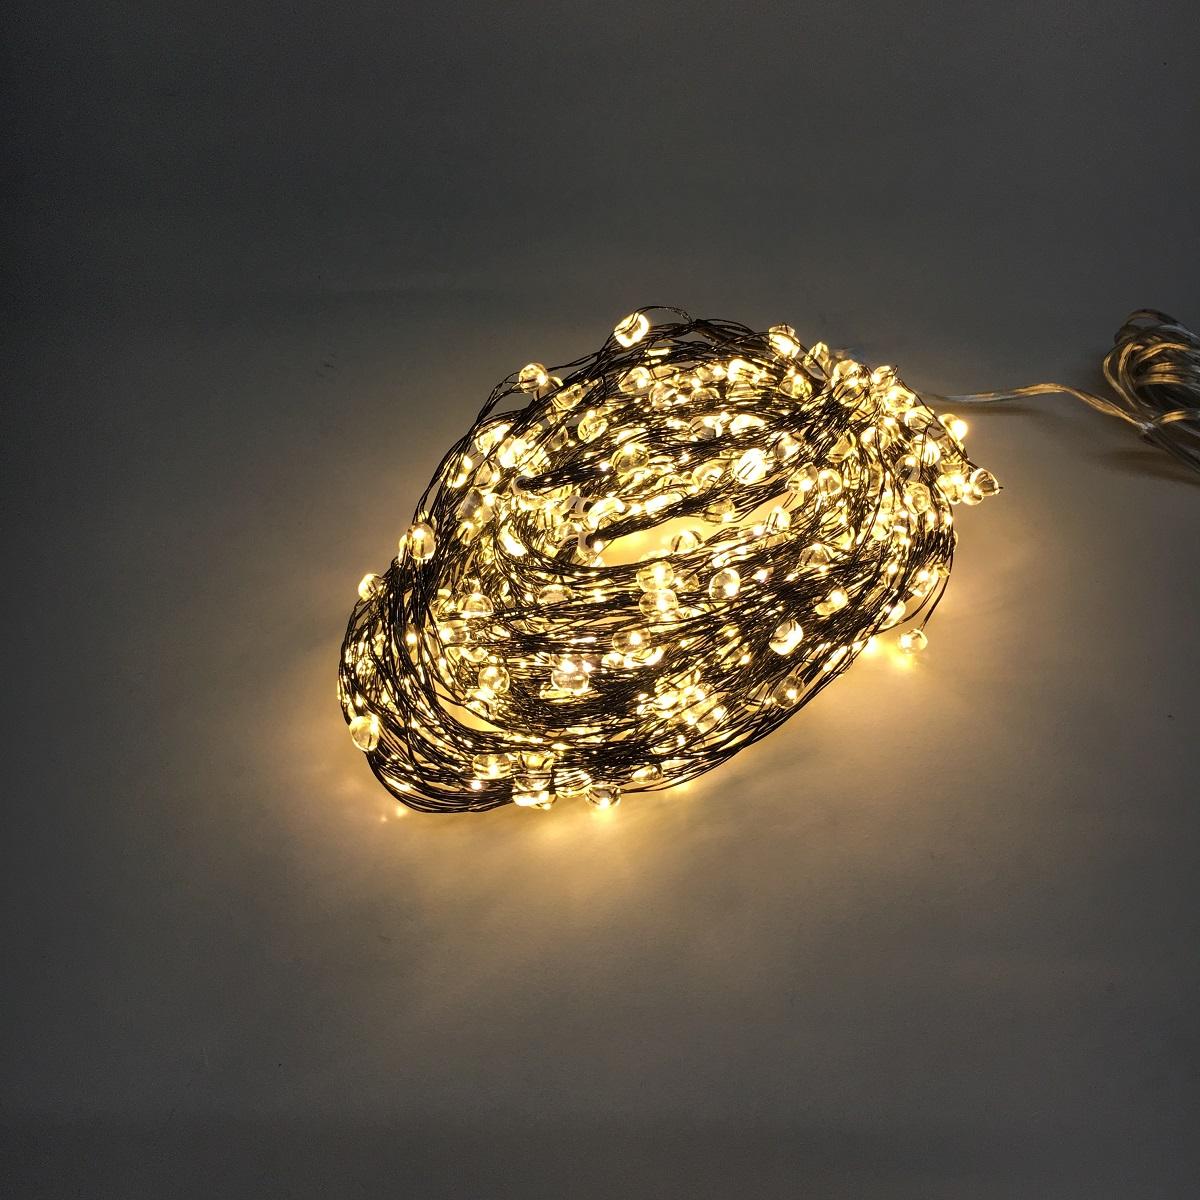 lampenhelden am design led lichterkette led regen big bubble schwarz 480 lichter innen au en. Black Bedroom Furniture Sets. Home Design Ideas